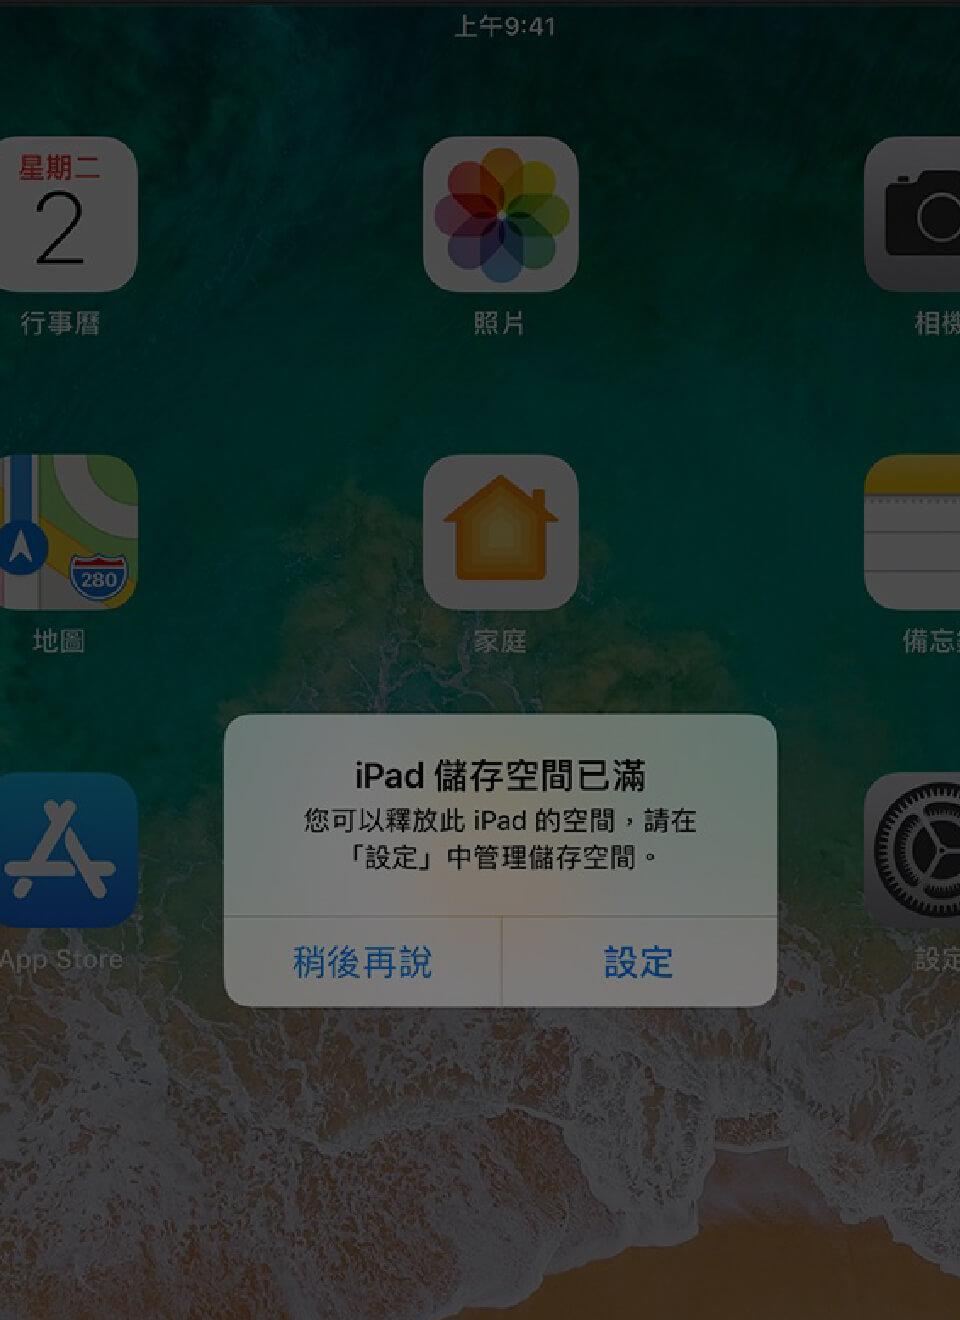 iPad容量升級